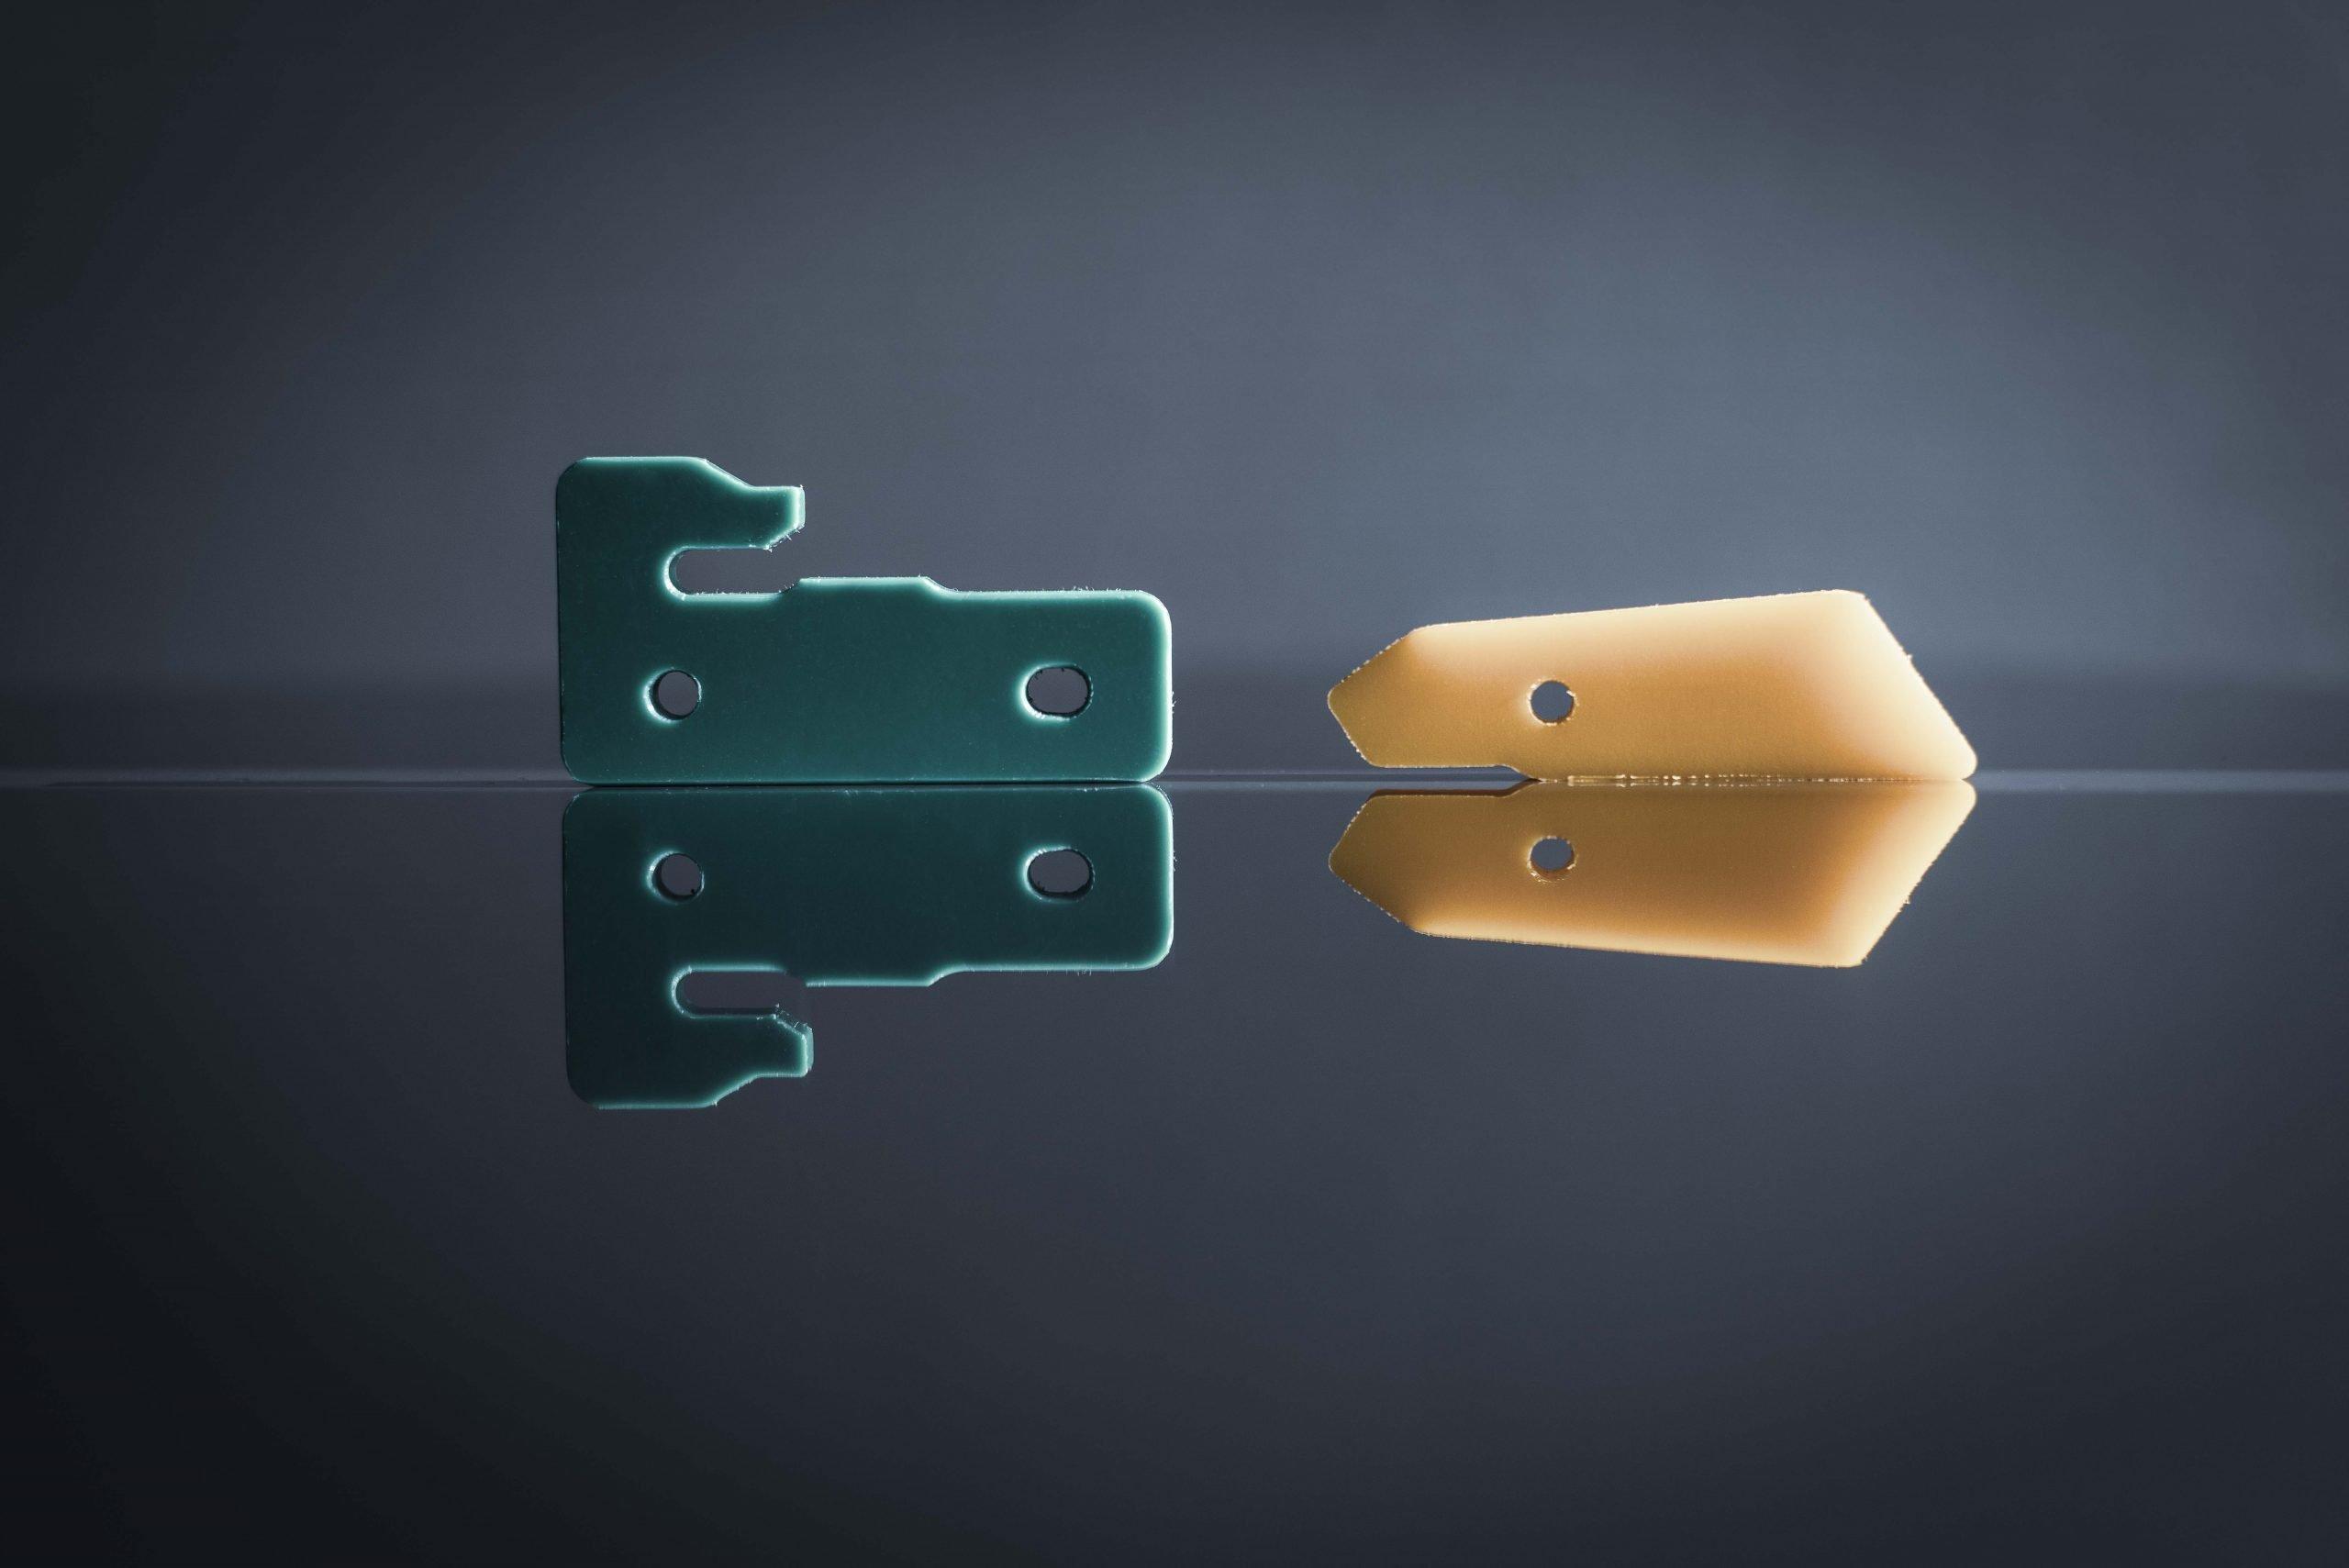 Dos plásticos técnicos juntos con un fondo negro